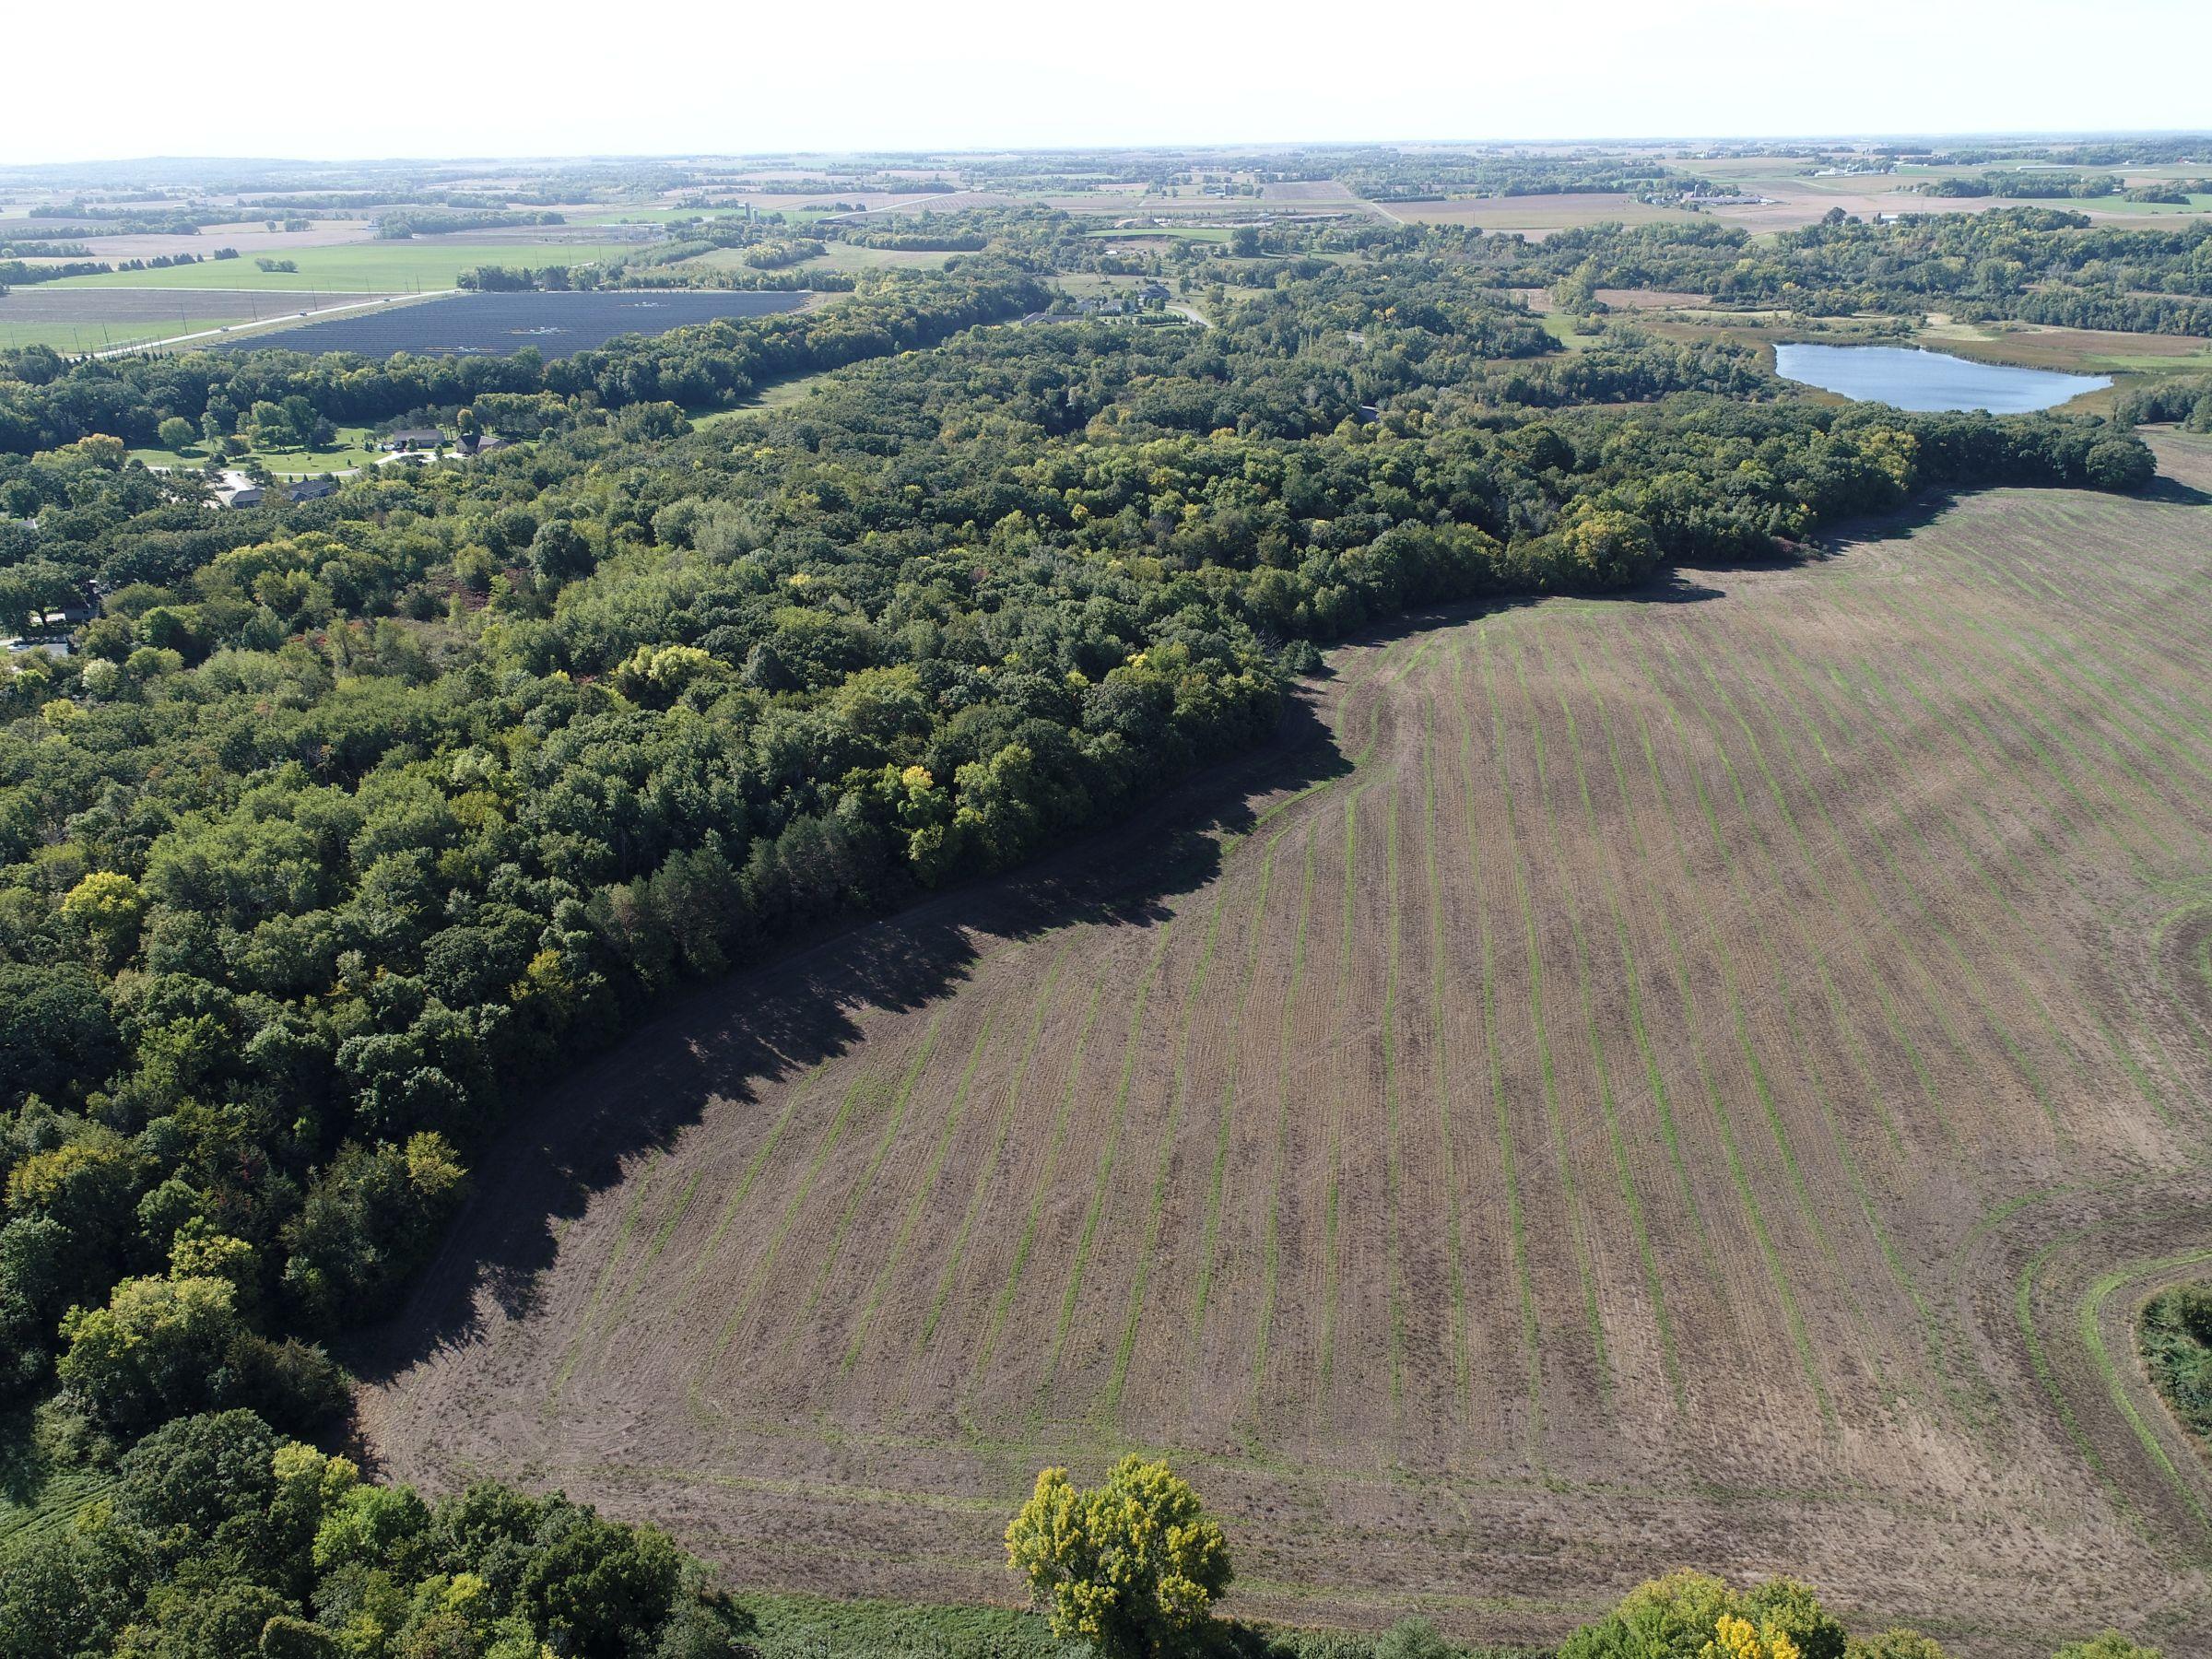 land-stearns-county-minnesota-298-acres-listing-number-15712-1-2021-09-23-123545.JPG